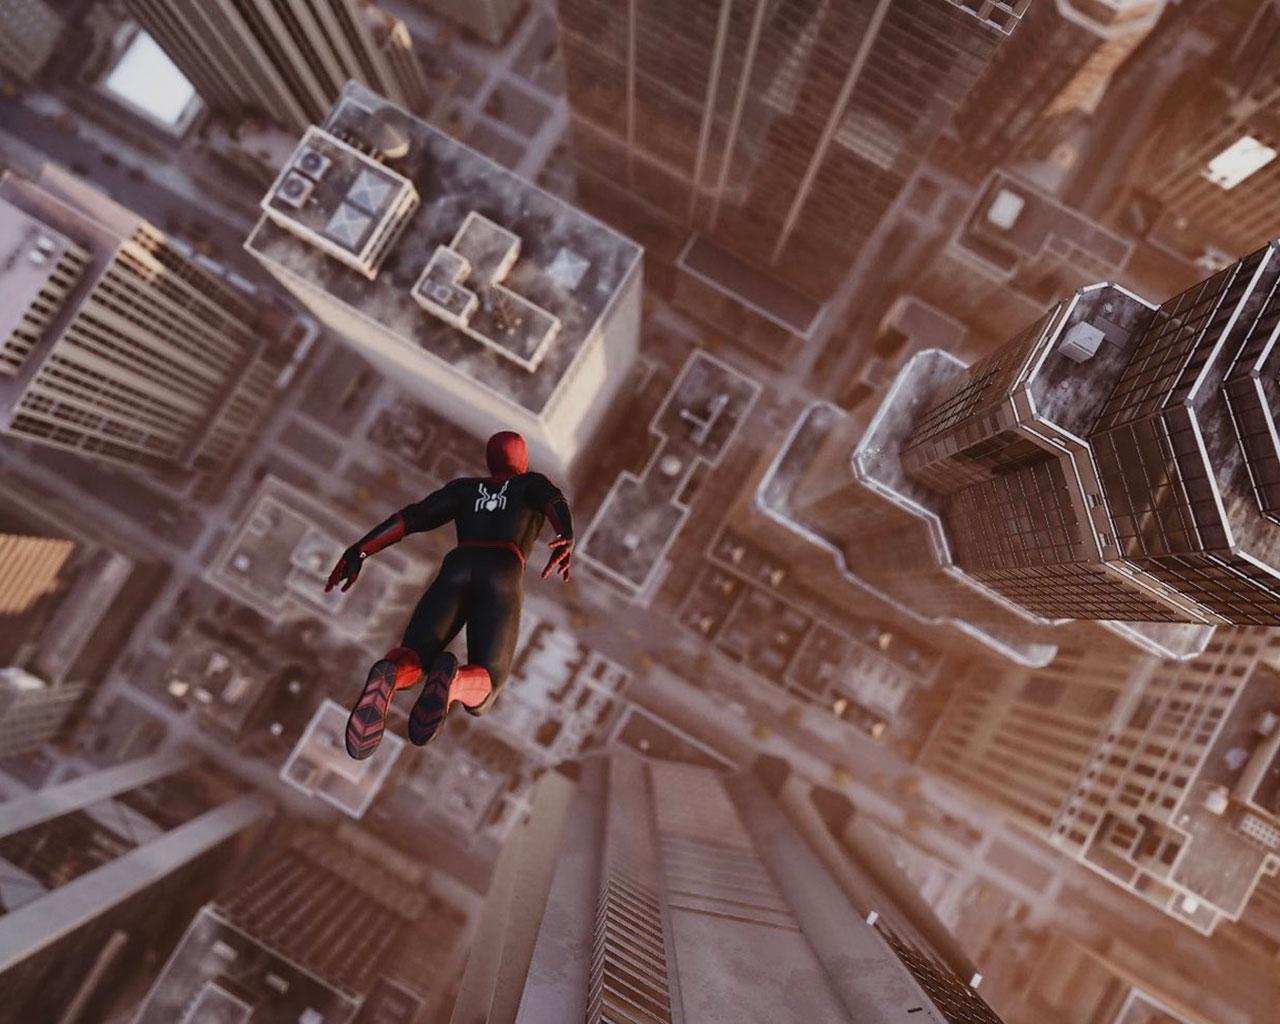 Free Spider-Man Wallpaper in 1280x1024